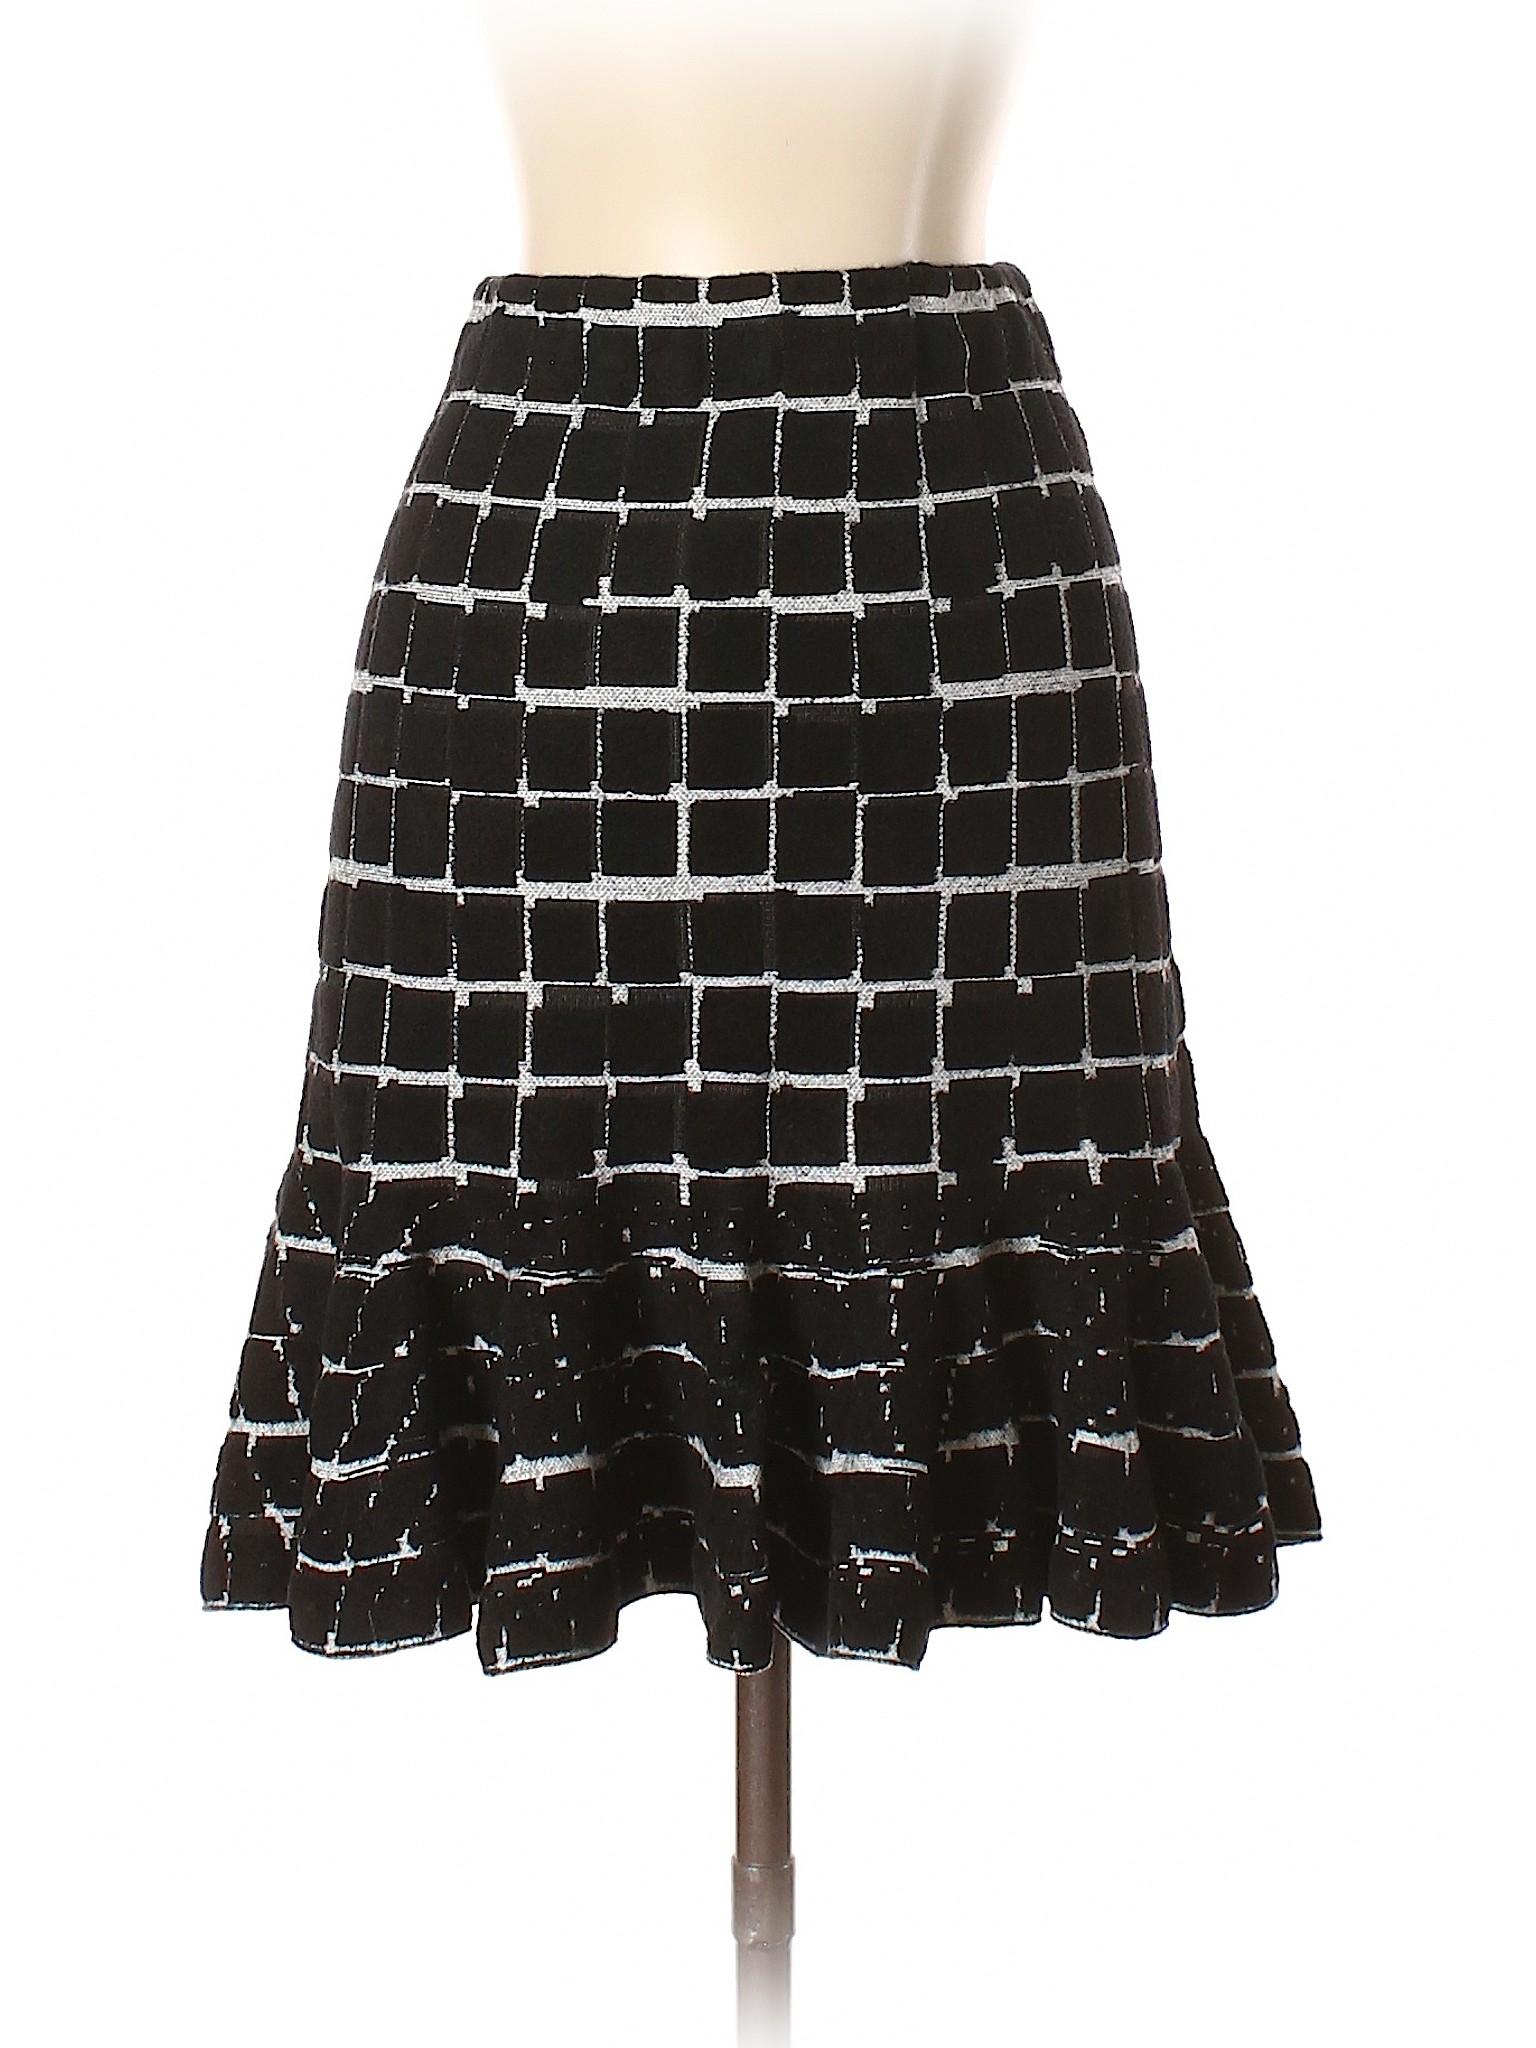 Boutique Casual Casual Boutique Casual Skirt Skirt Casual Boutique Skirt Casual Boutique Boutique Skirt RtqxA